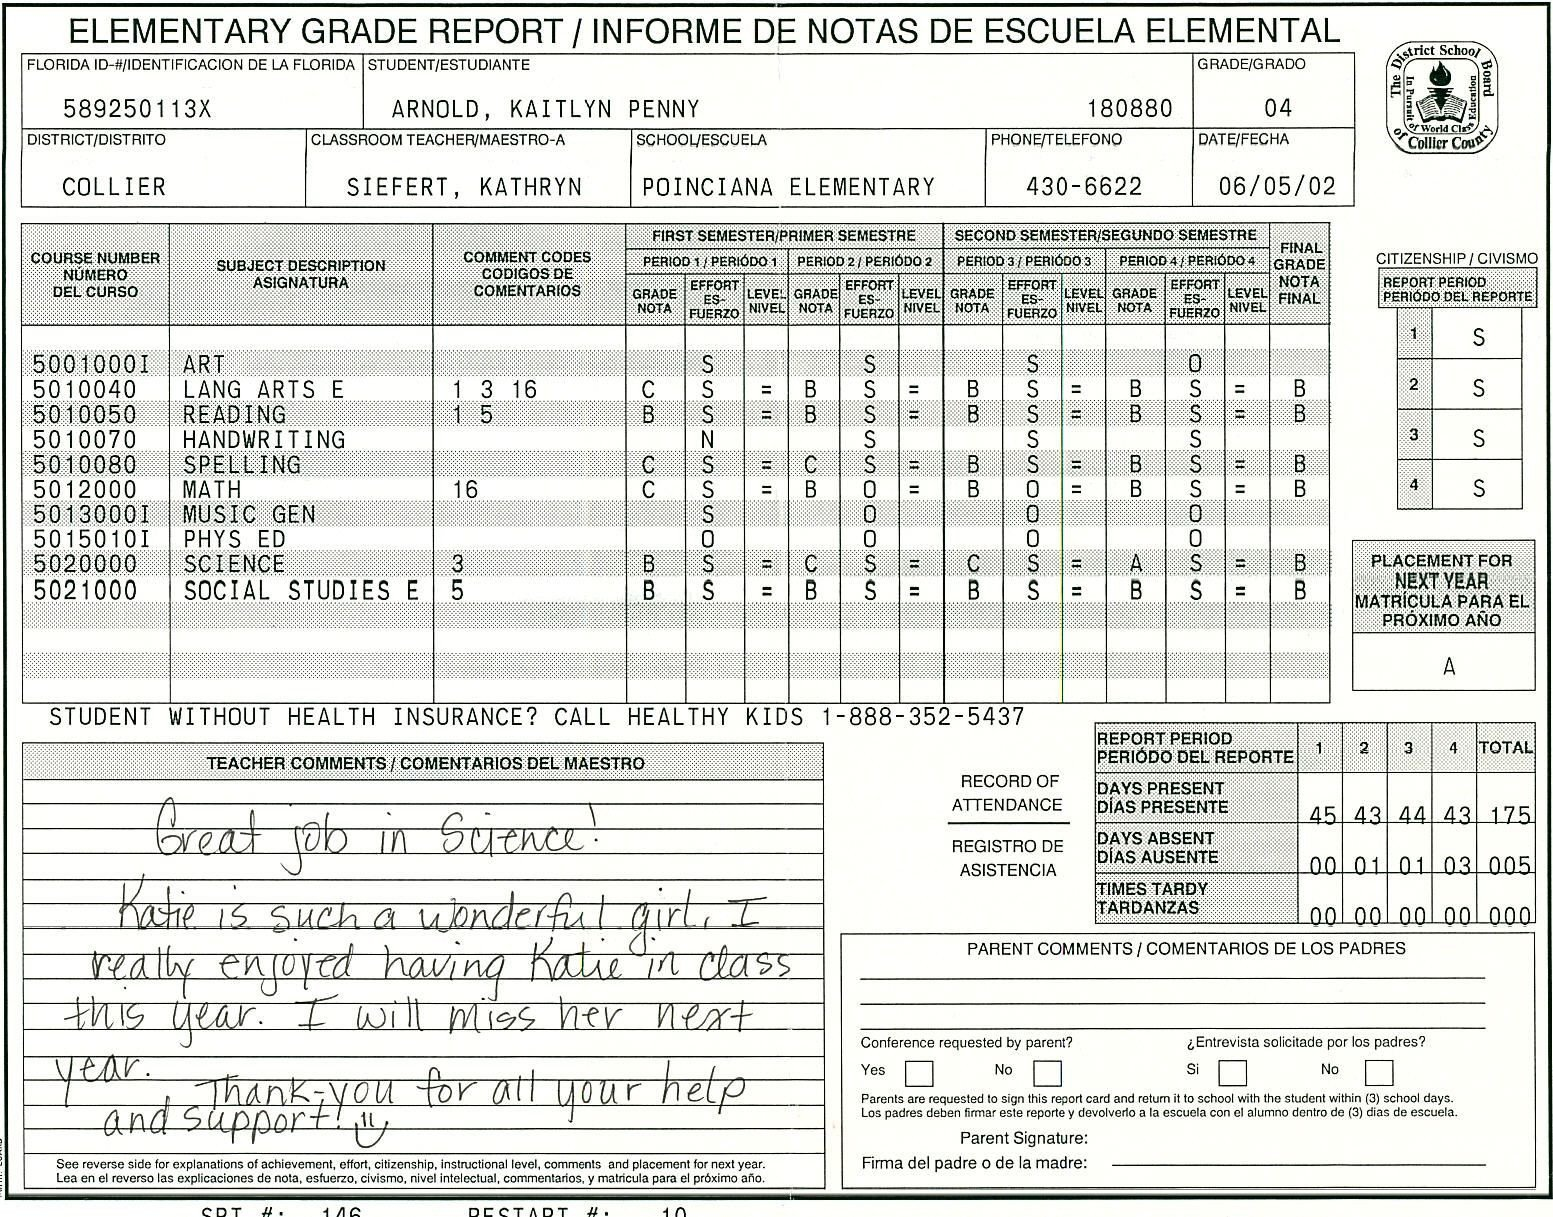 High School Report Card Template Elementary School Report Card Template